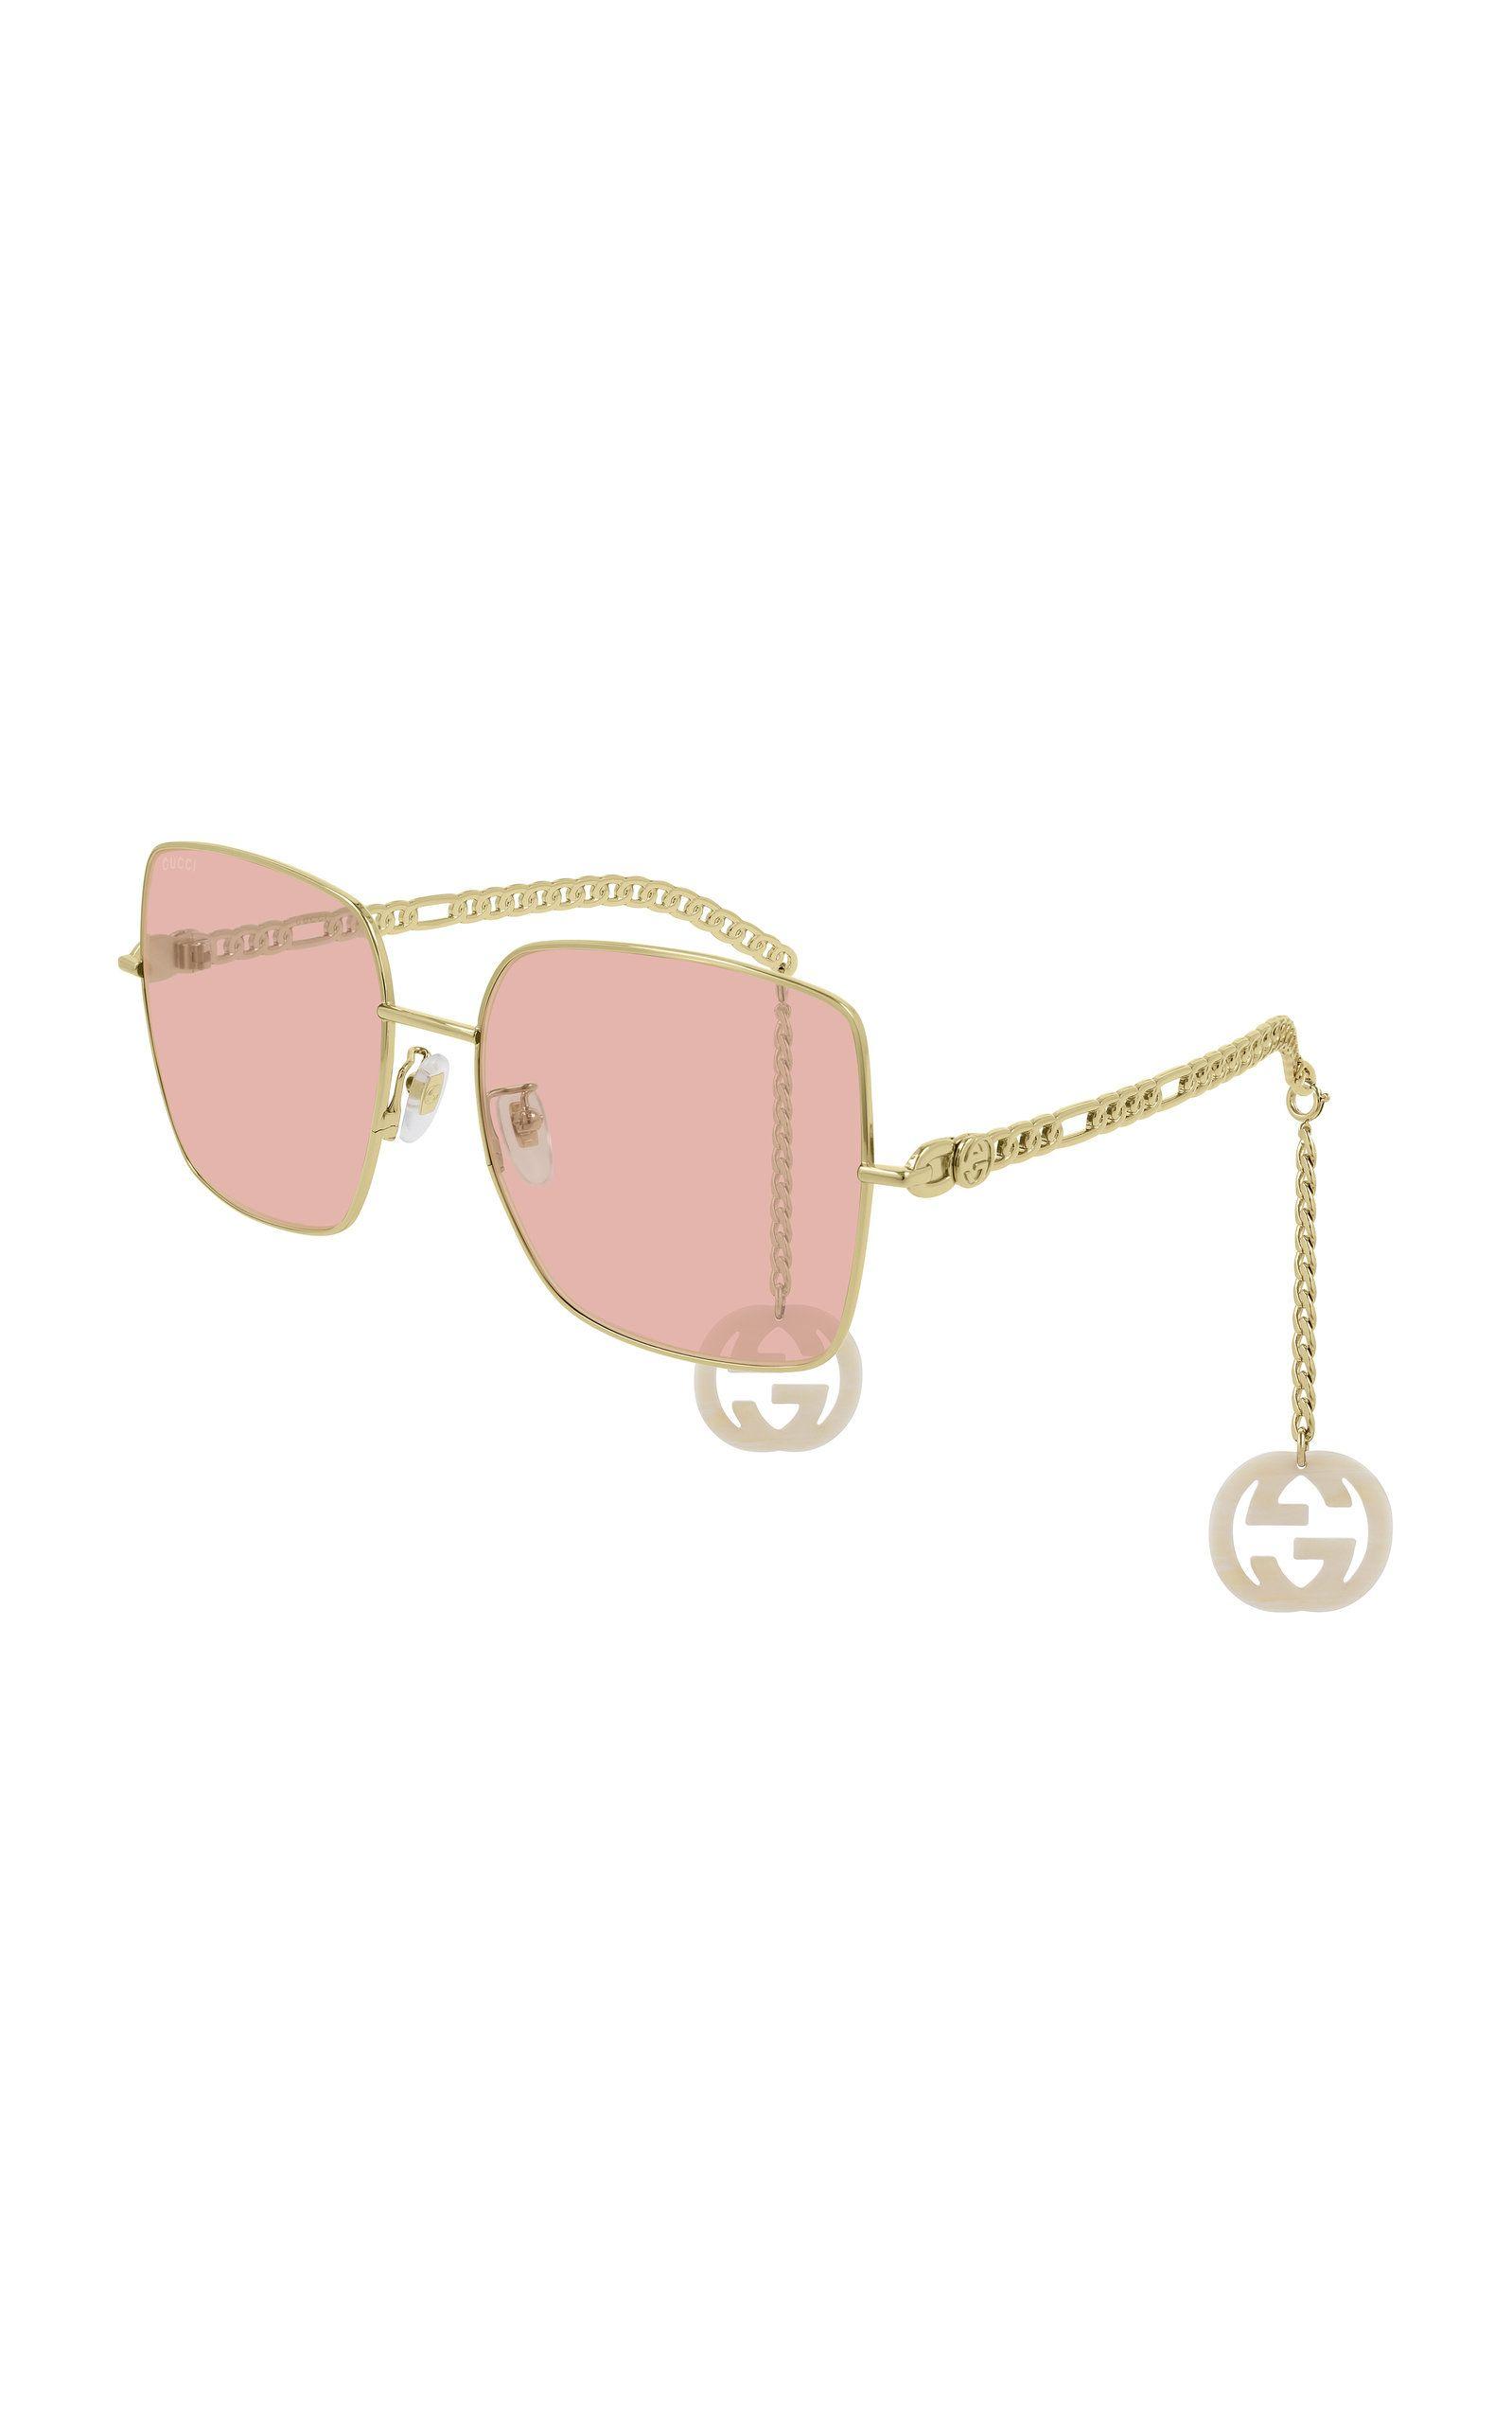 Chain Detailed Square Frame Sunglasses By Gucci Now Available On Moda Operandi Sunglass Frames Sunglasses Glasses Fashion